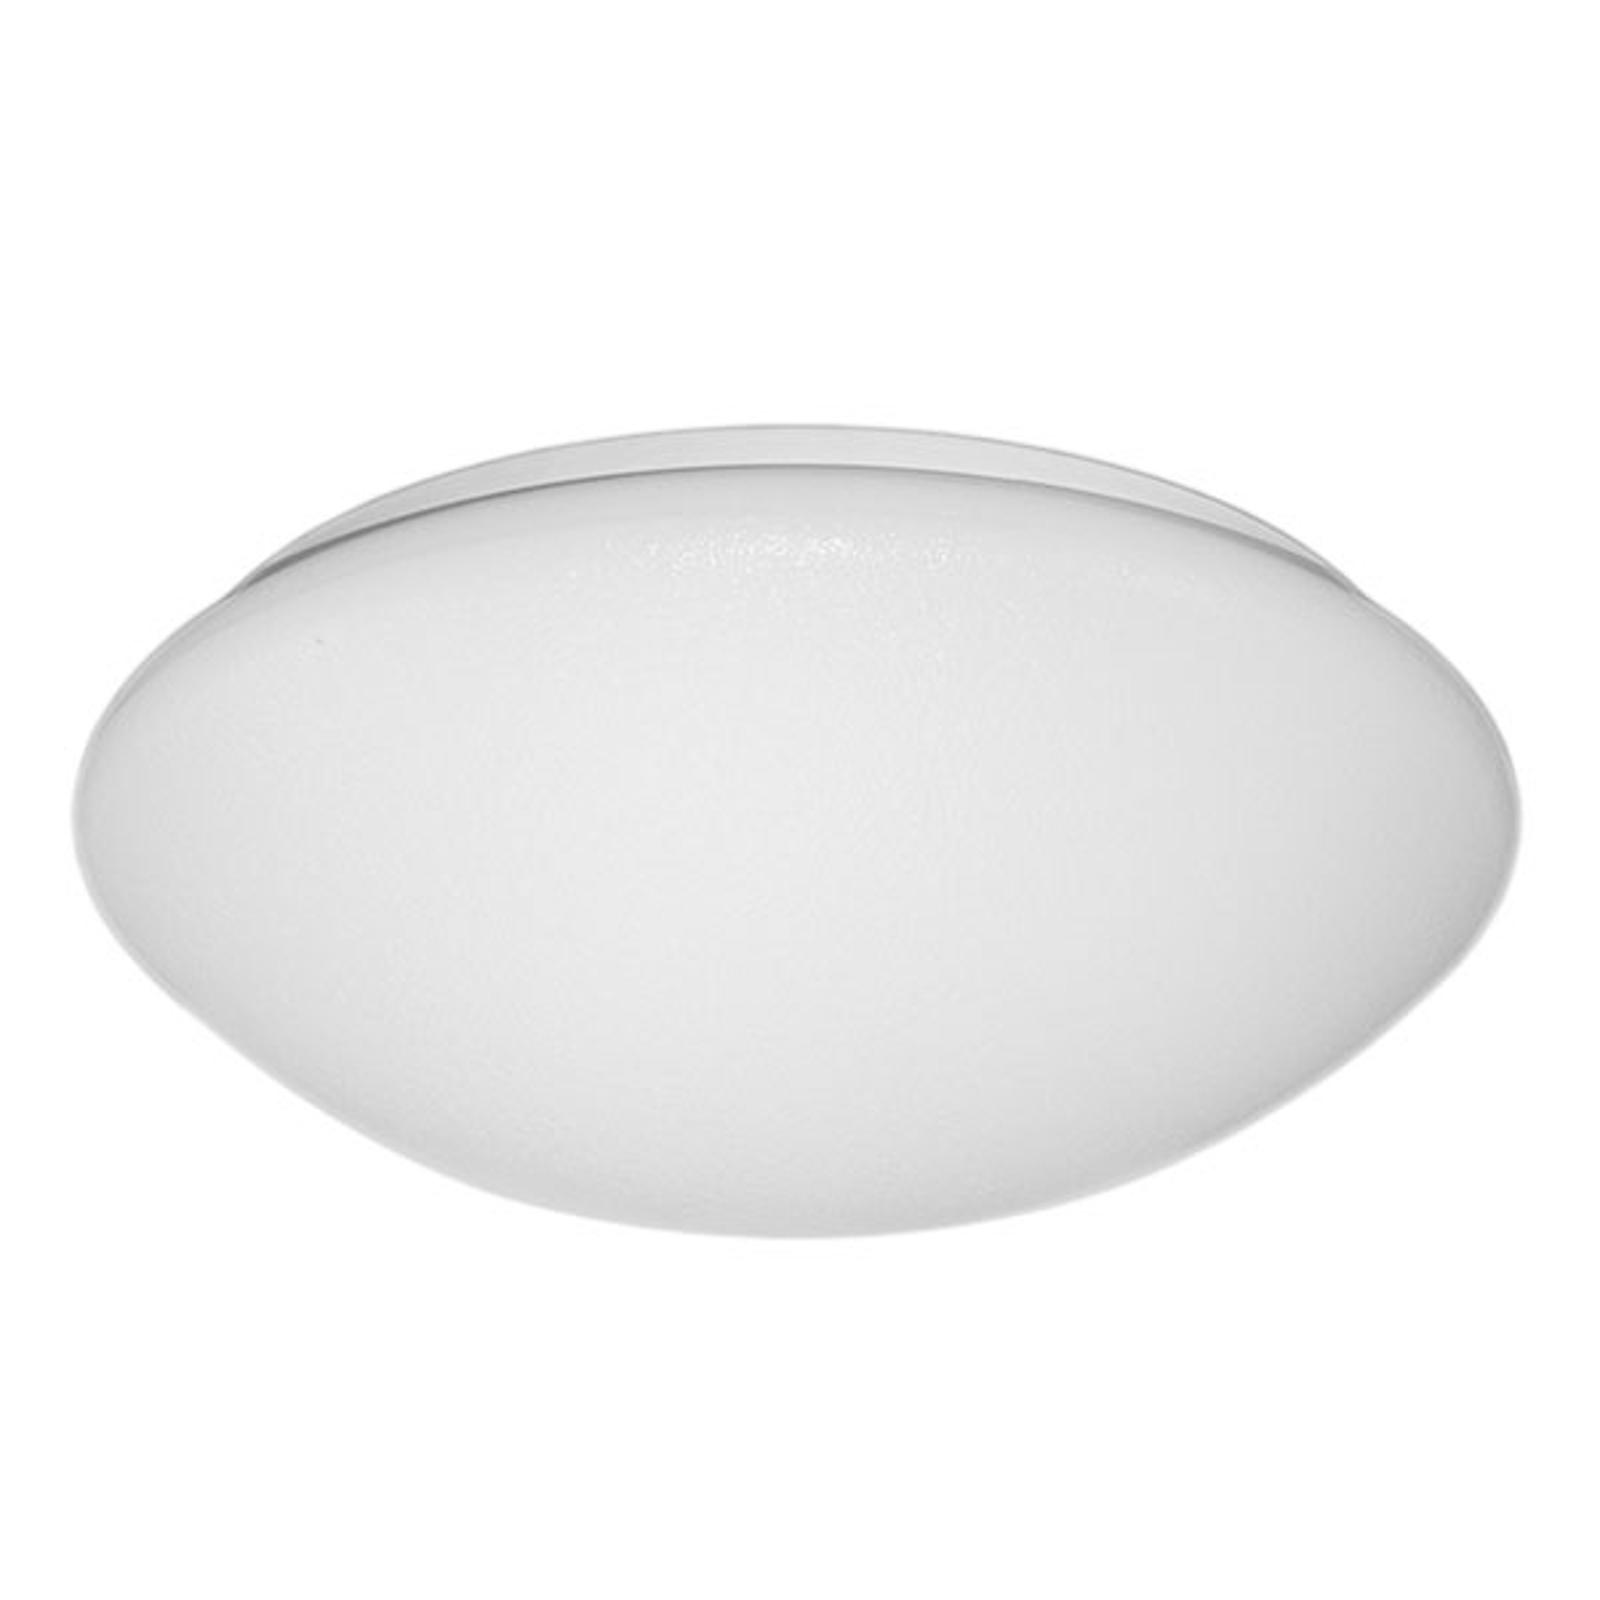 Grote LED plafondlamp, slagvast, 35 W, 3.000 K